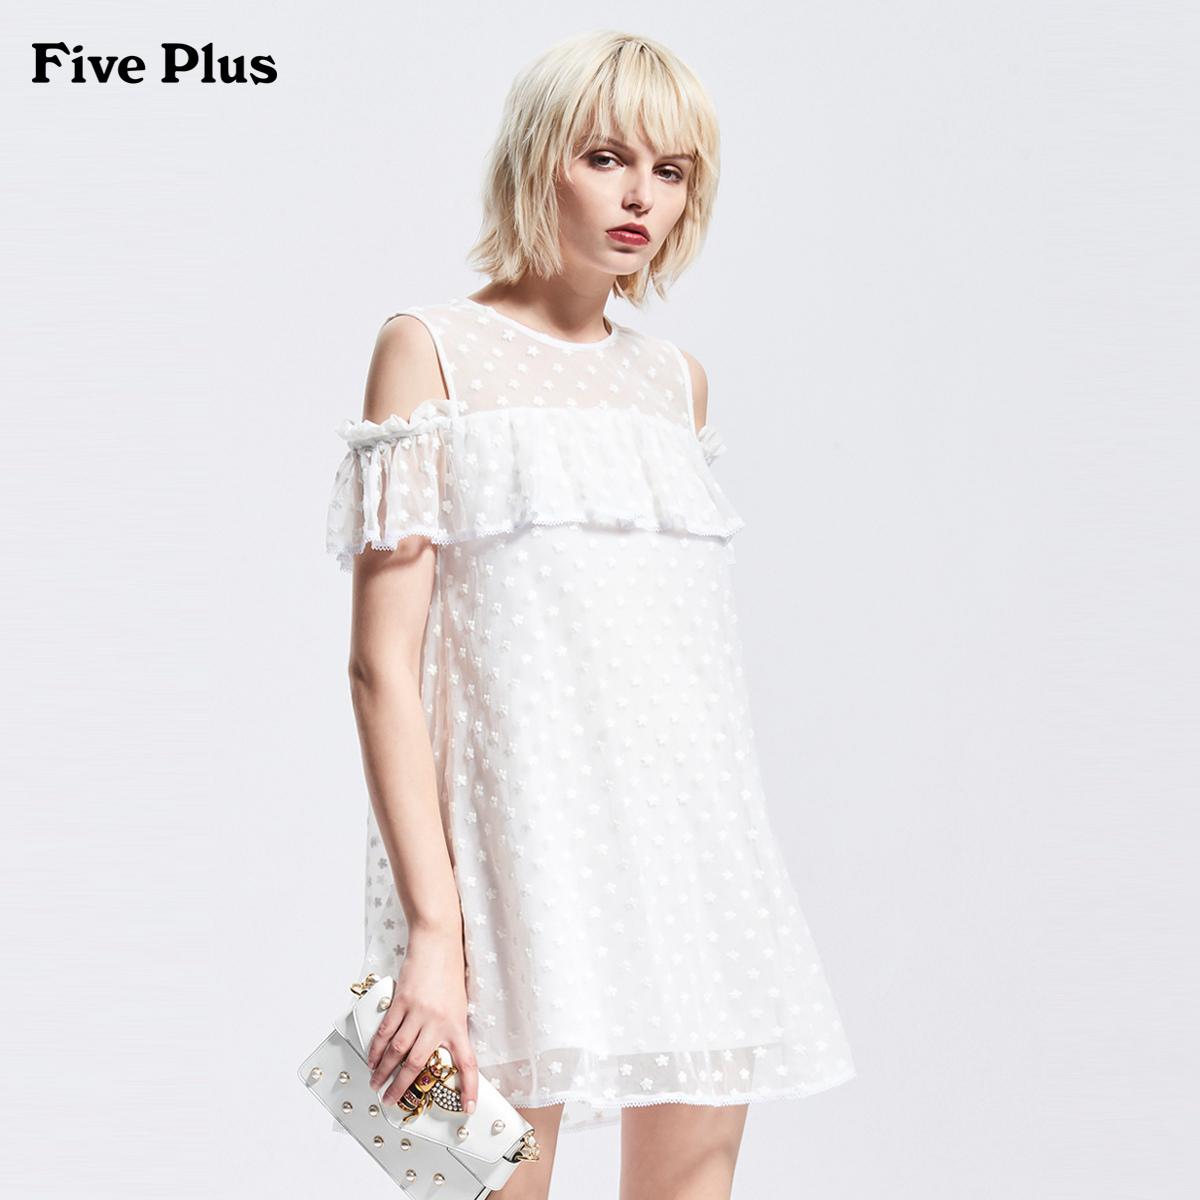 Five Plus2018新品女夏装碎花连衣裙露肩A字裙短袖宽松荷叶边纱裙